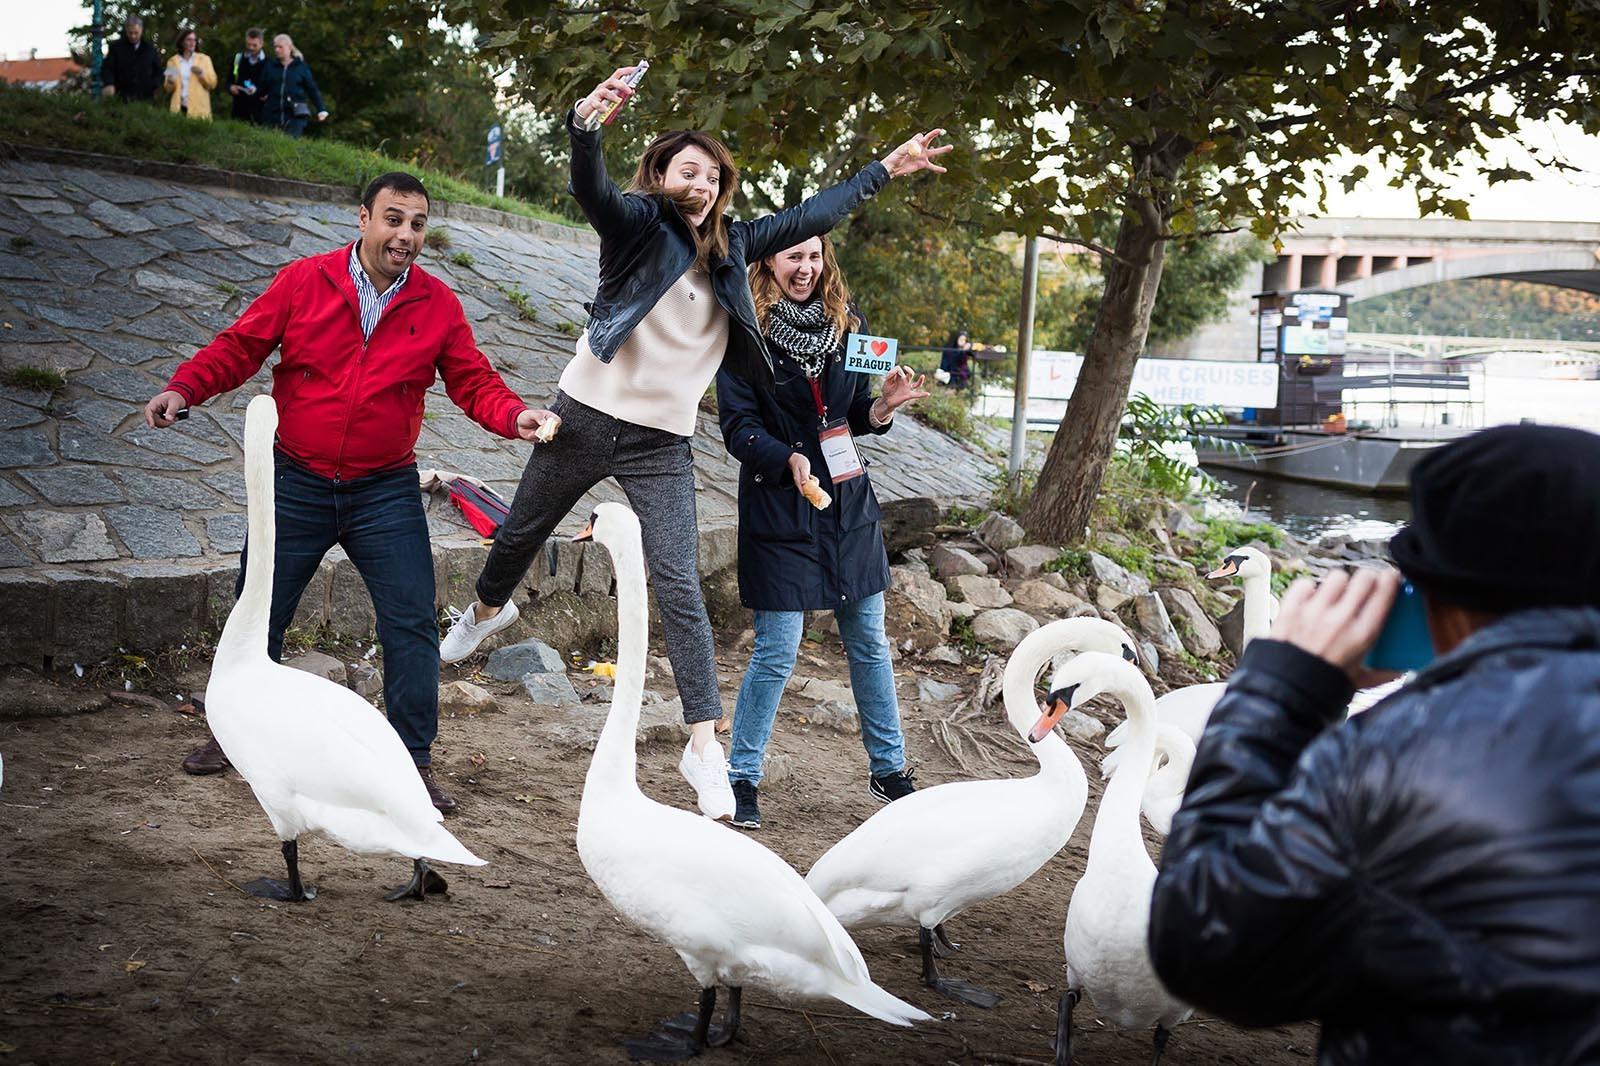 Team se foti u brehu Vltavy jak krmi labute pri interaktivni prohlidce mesta Photopoly